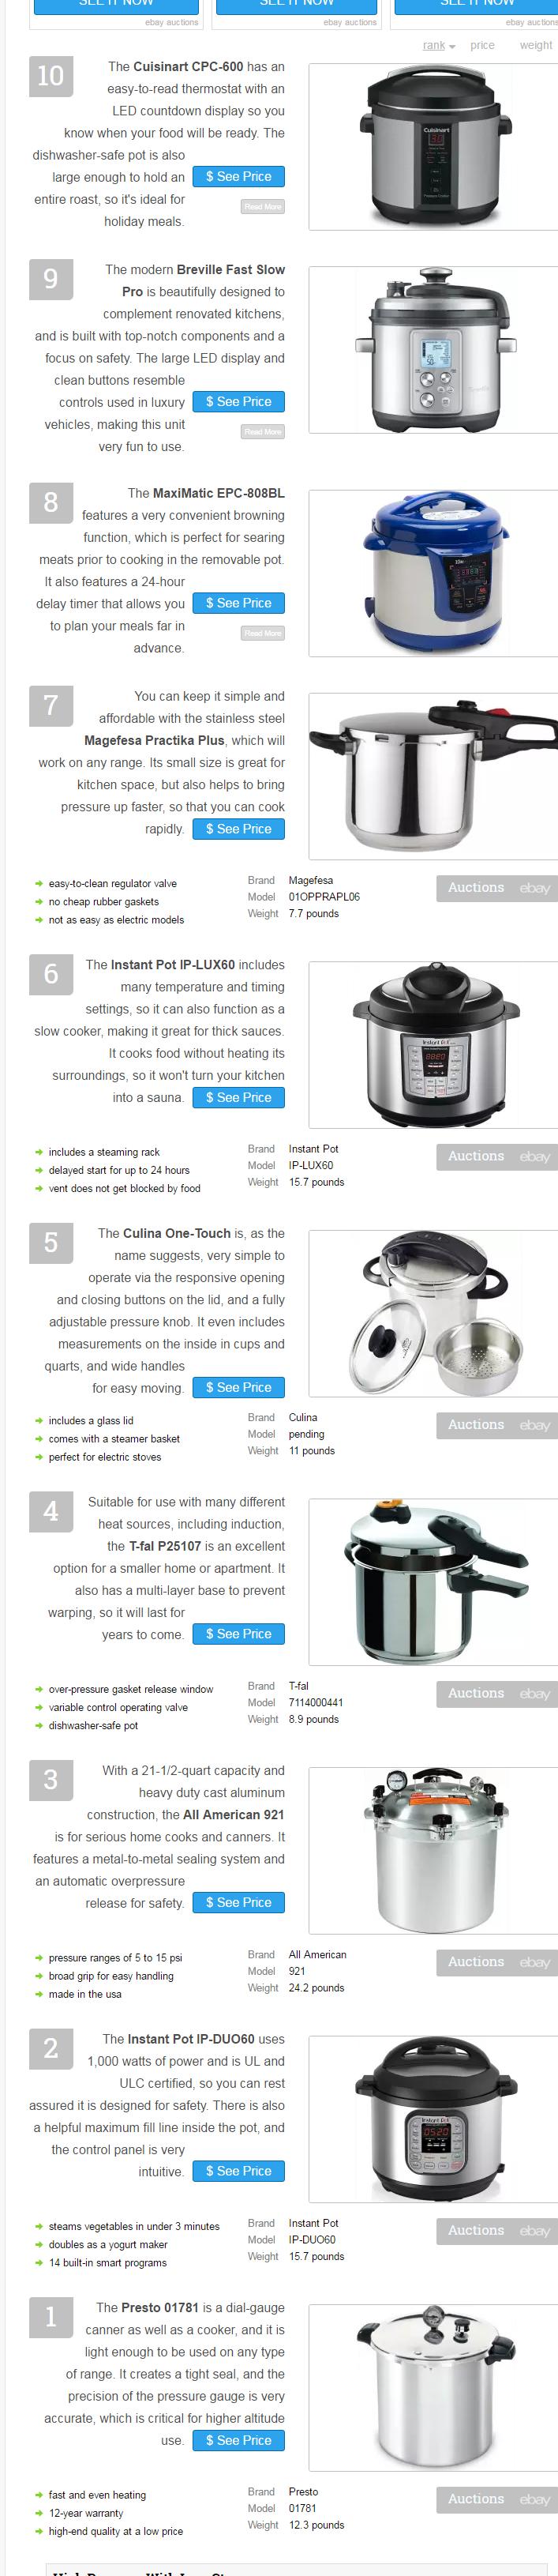 screencapture-wiki-ezvid-best-pressure-cookers-1484153013062